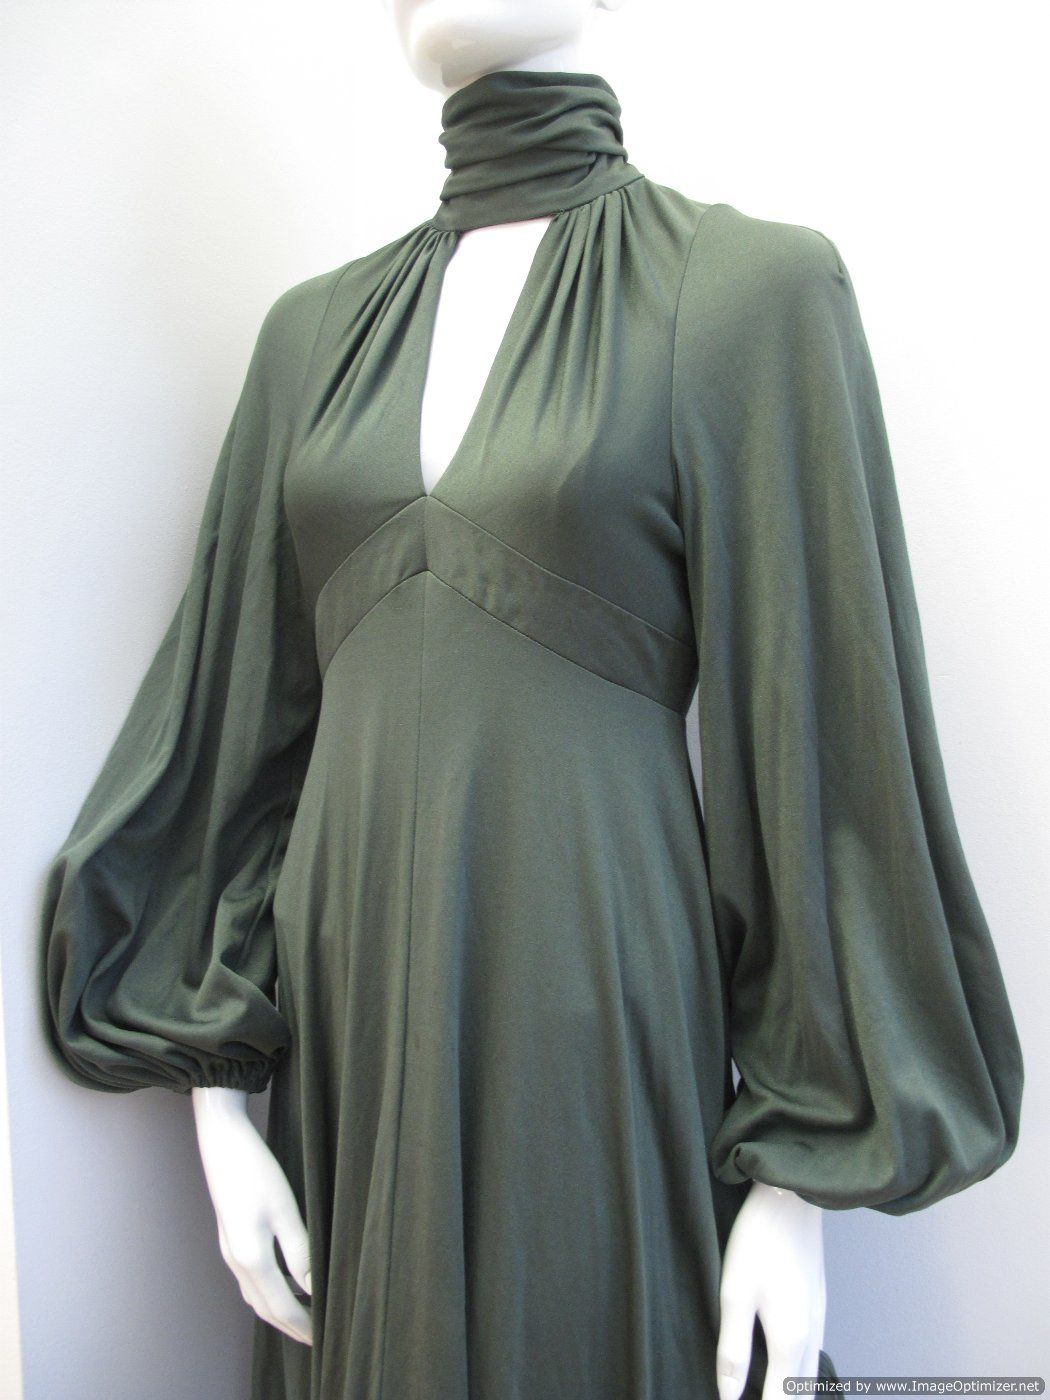 1970-s-olive-green-jersey-vintage-evening-dress-1235-p.jpg (1050×1400)